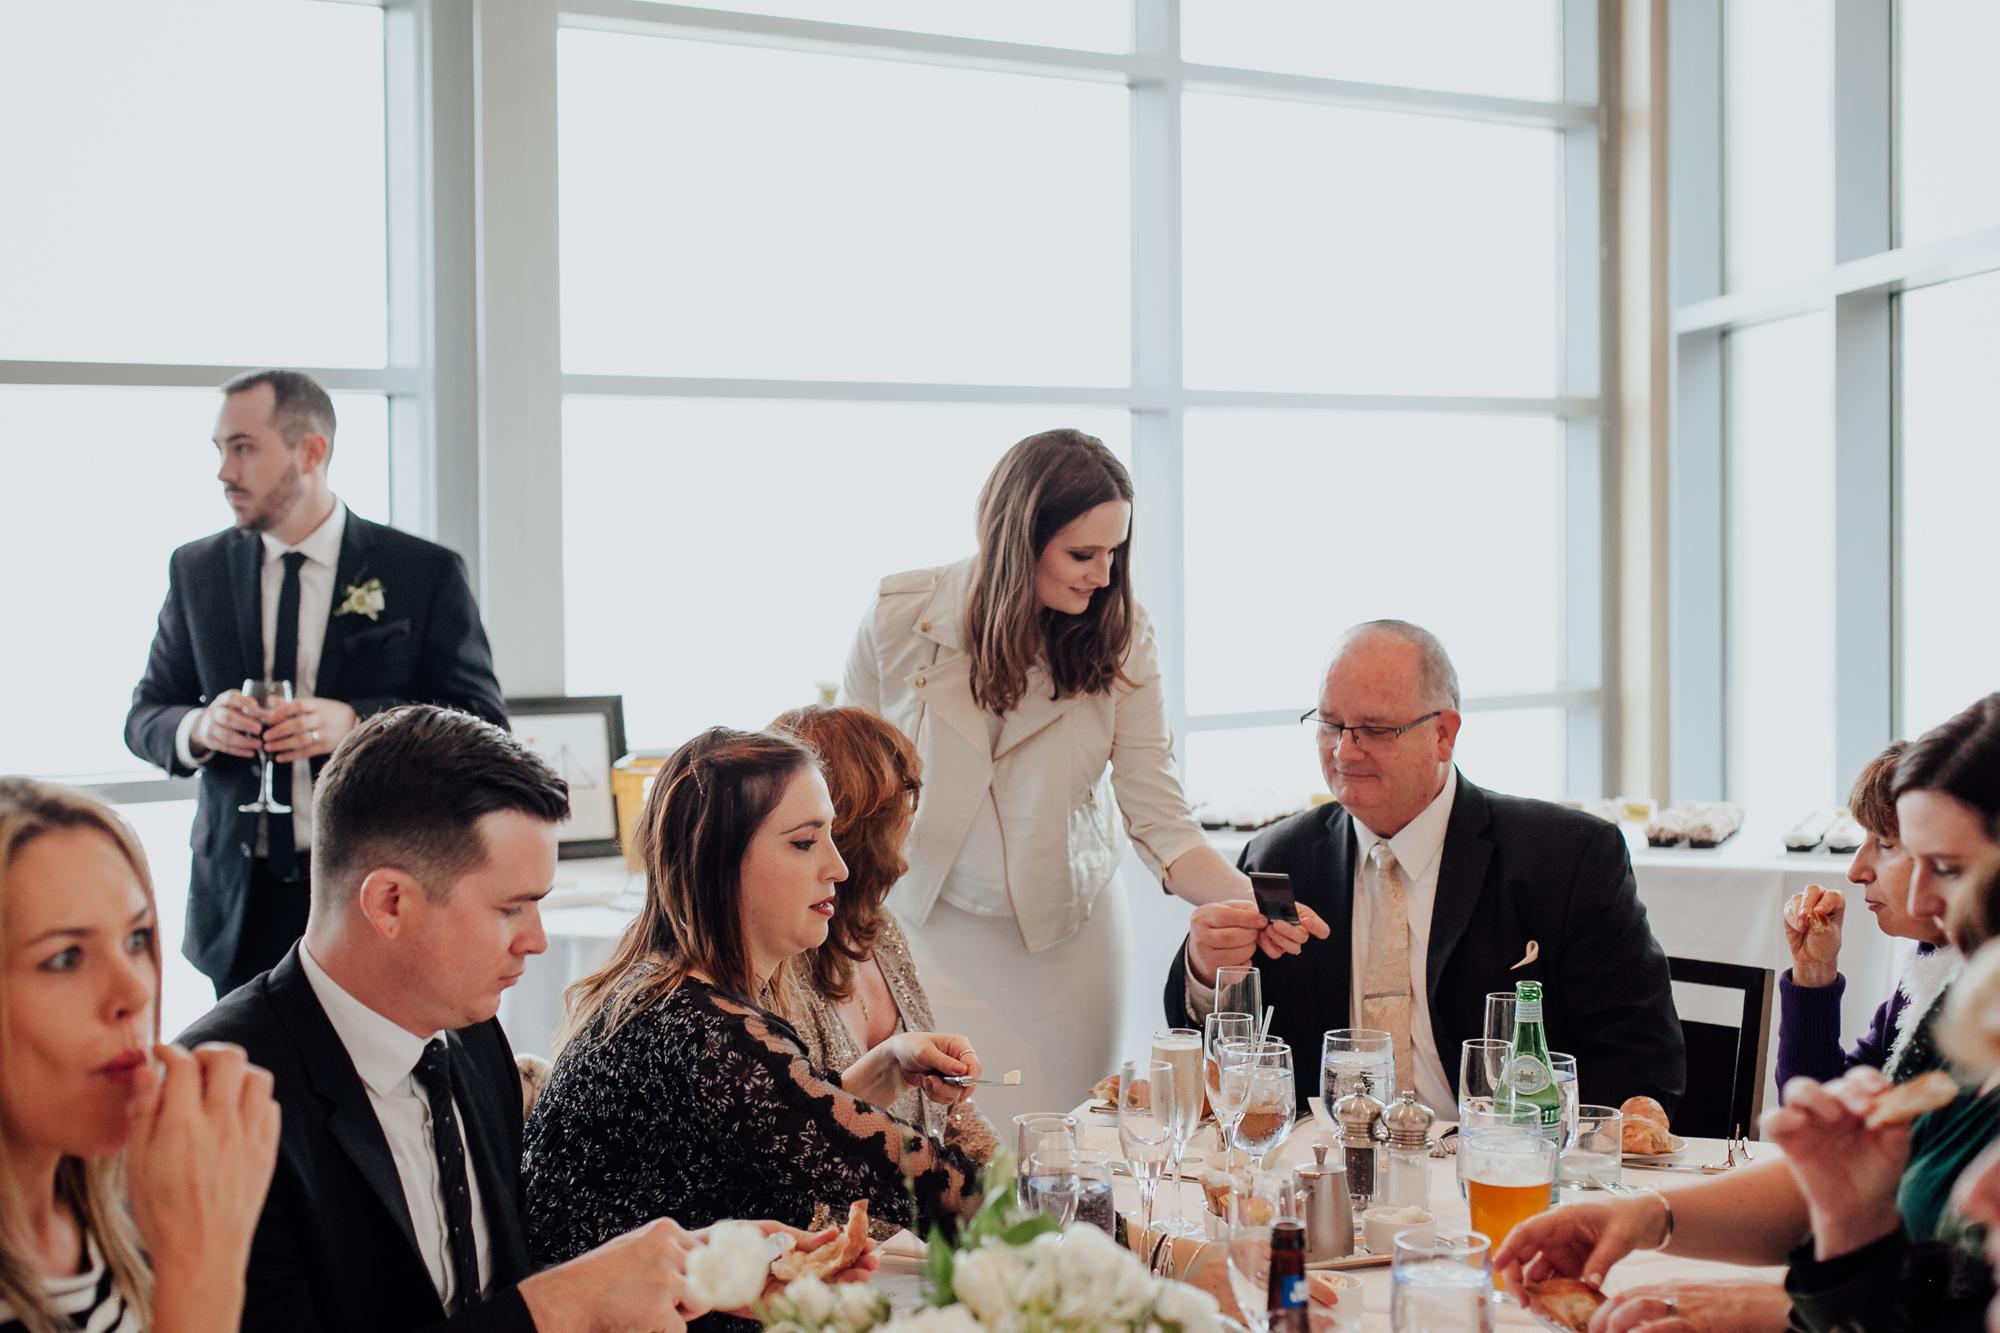 san-francisco-city-hall-wedding-marble-rye-photography-011751.JPG